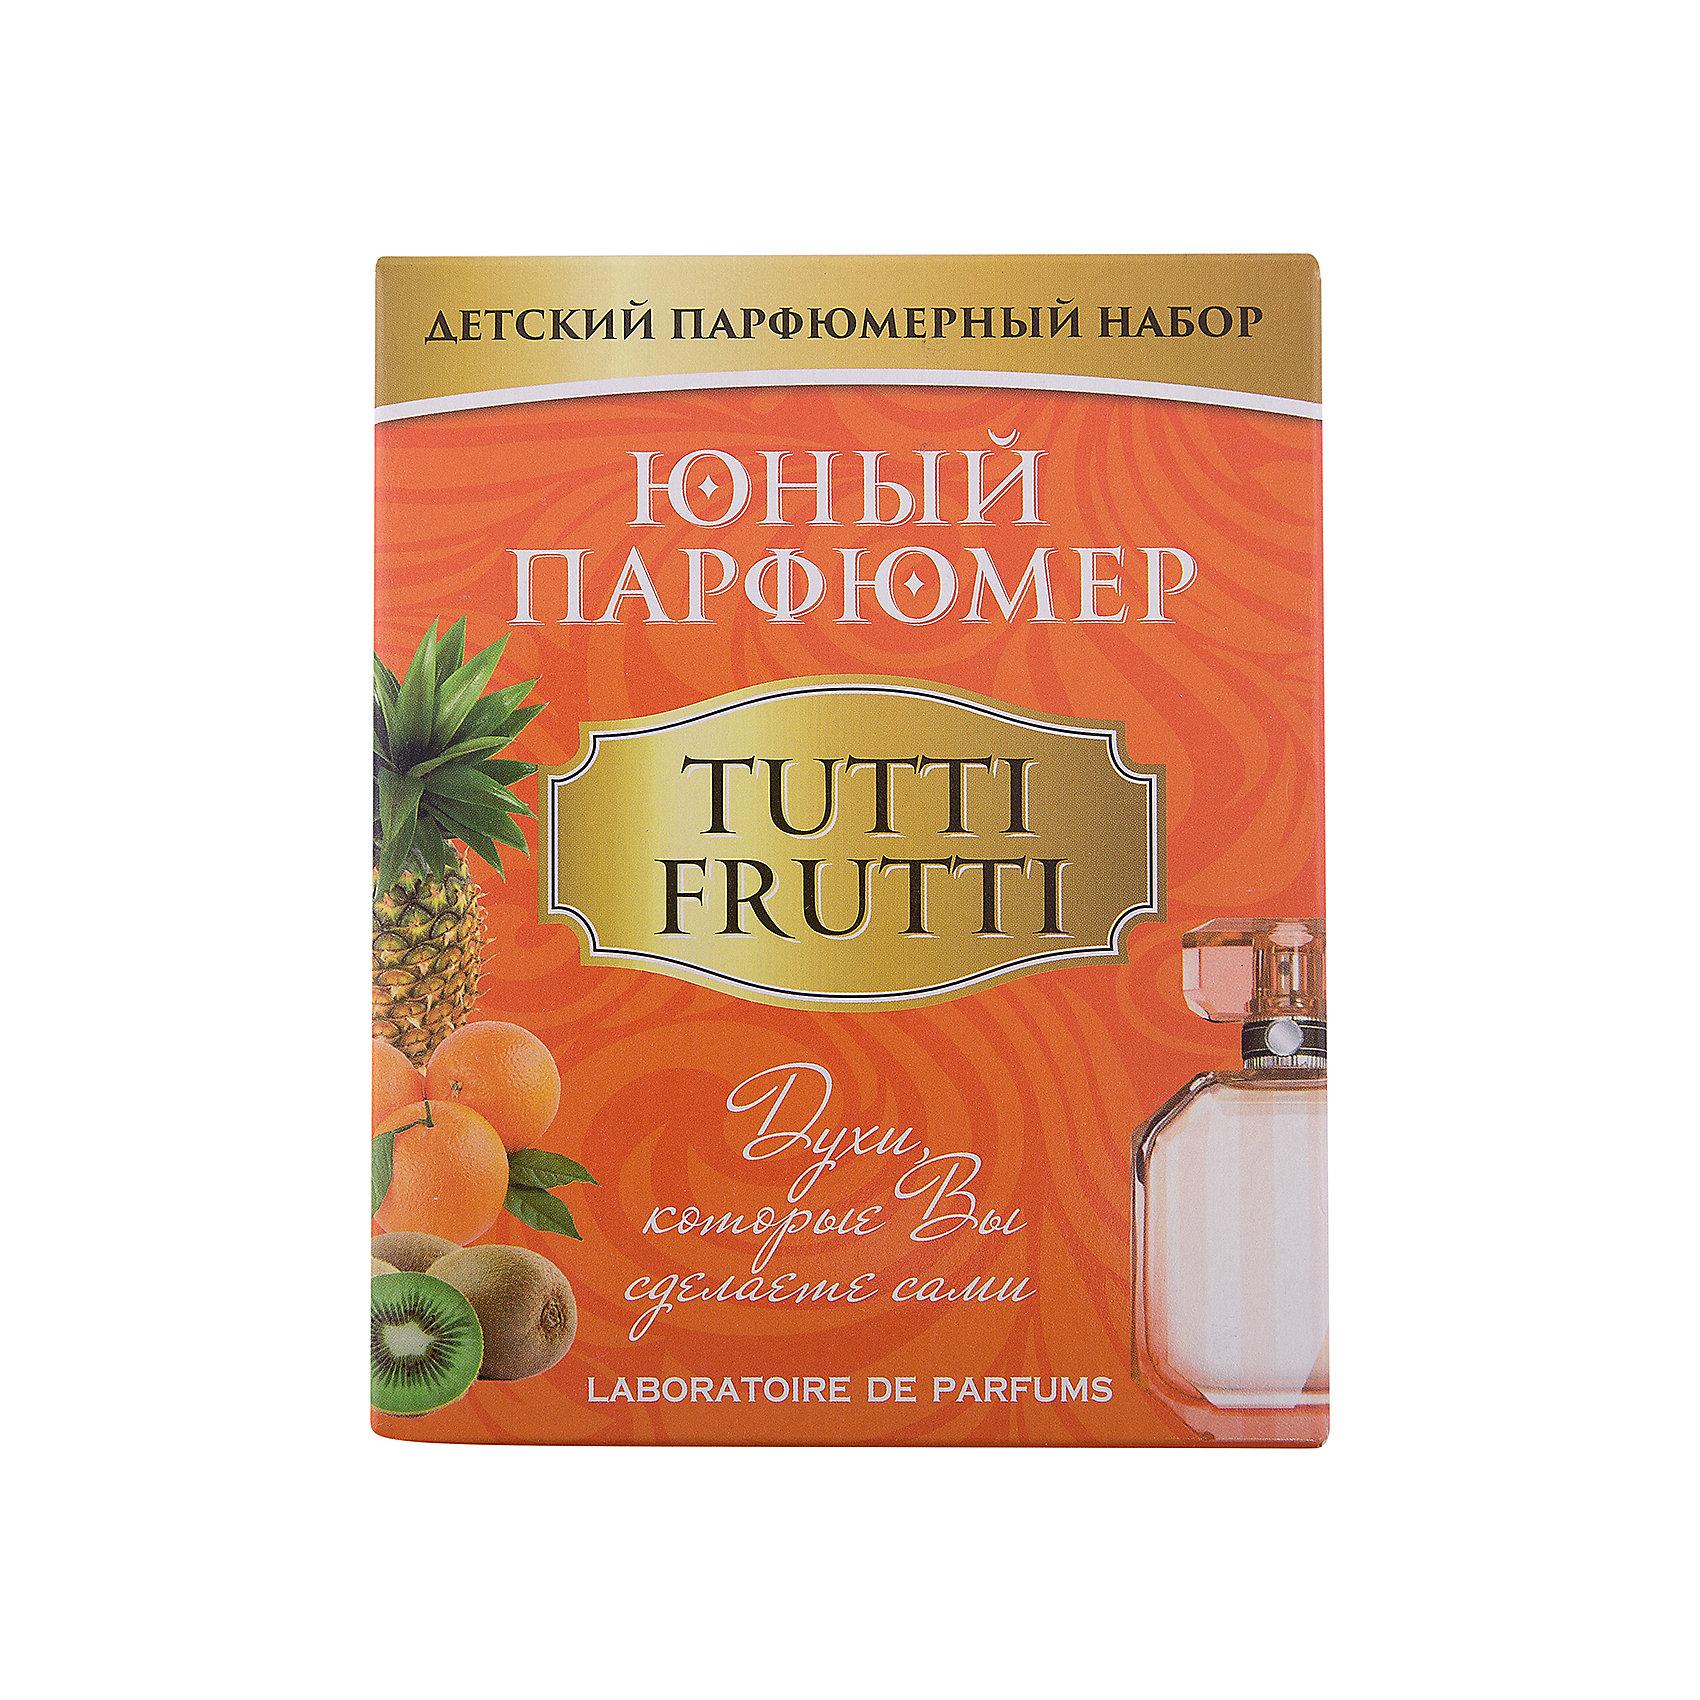 Каррас Набор Юный Парфюмер (мини) TUTTI FRUTTI tutti frutti smart skin чехол для samsung tab 3 8 0 white